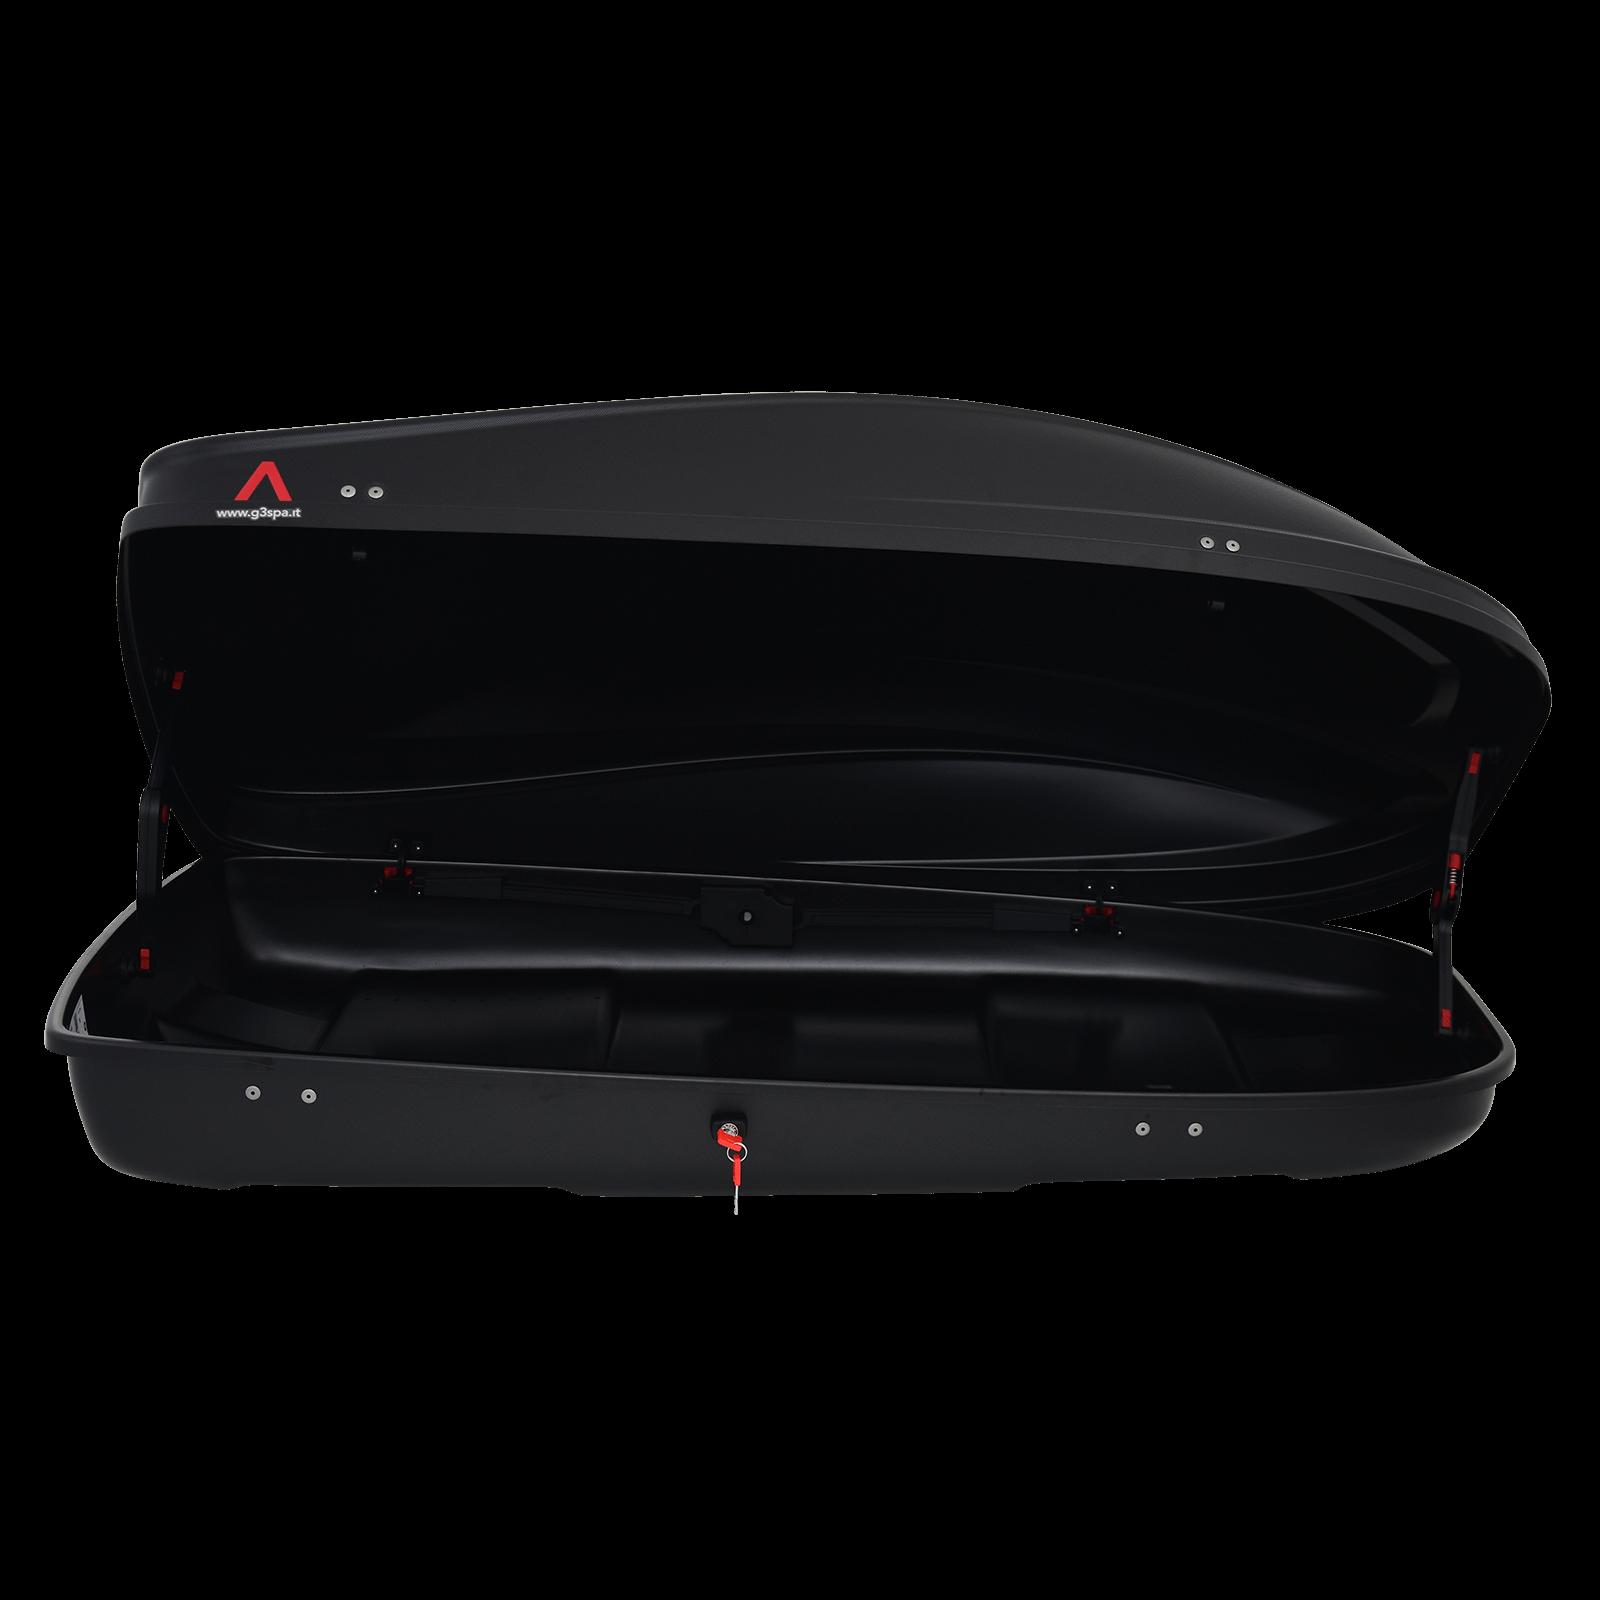 Dachbox G3 Spark 400 schwarz matt - Bild 2